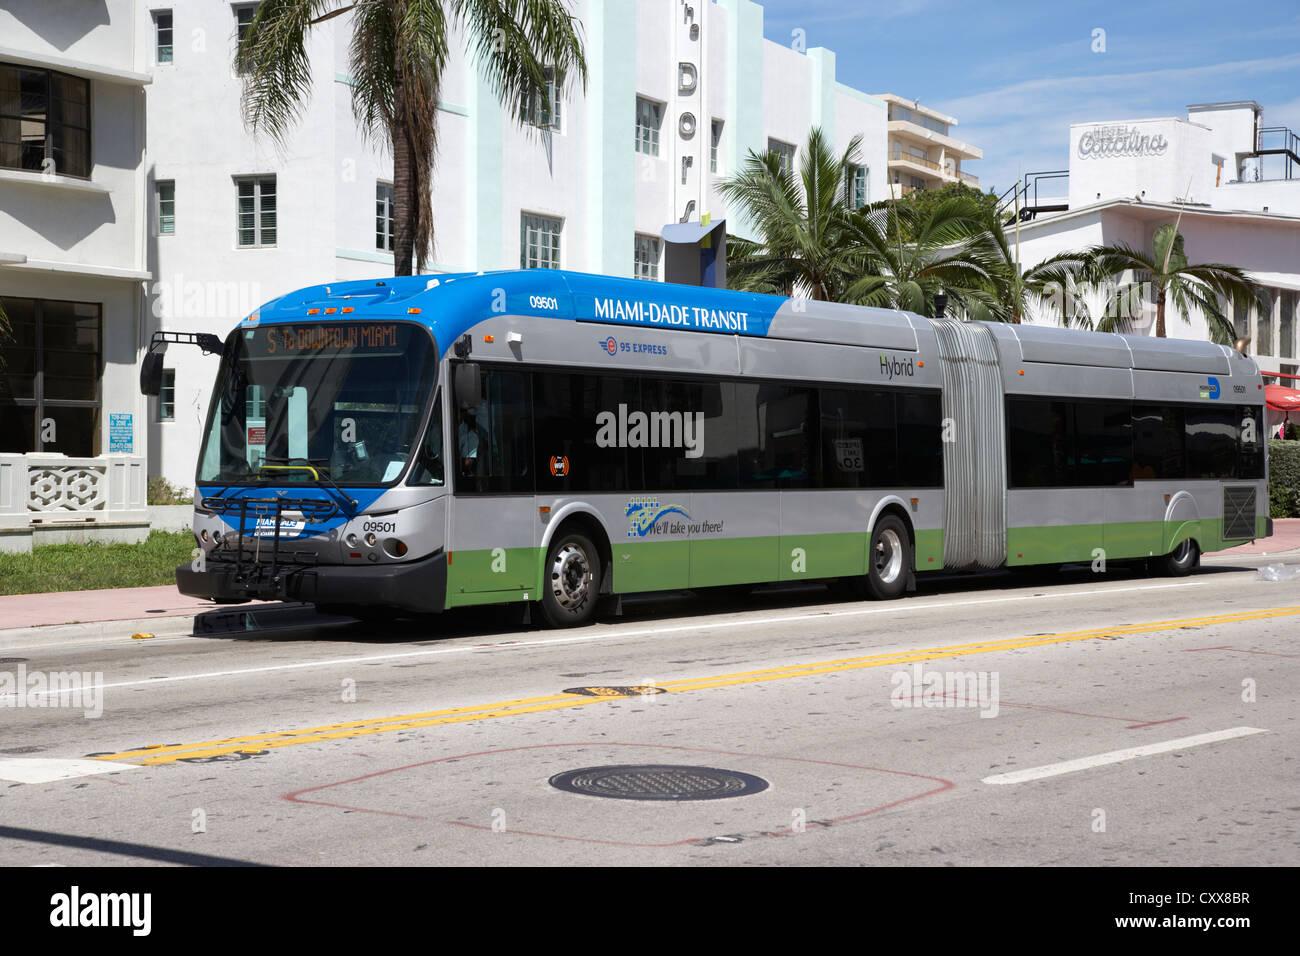 miami-dade transit hybrid public bus transport miami south